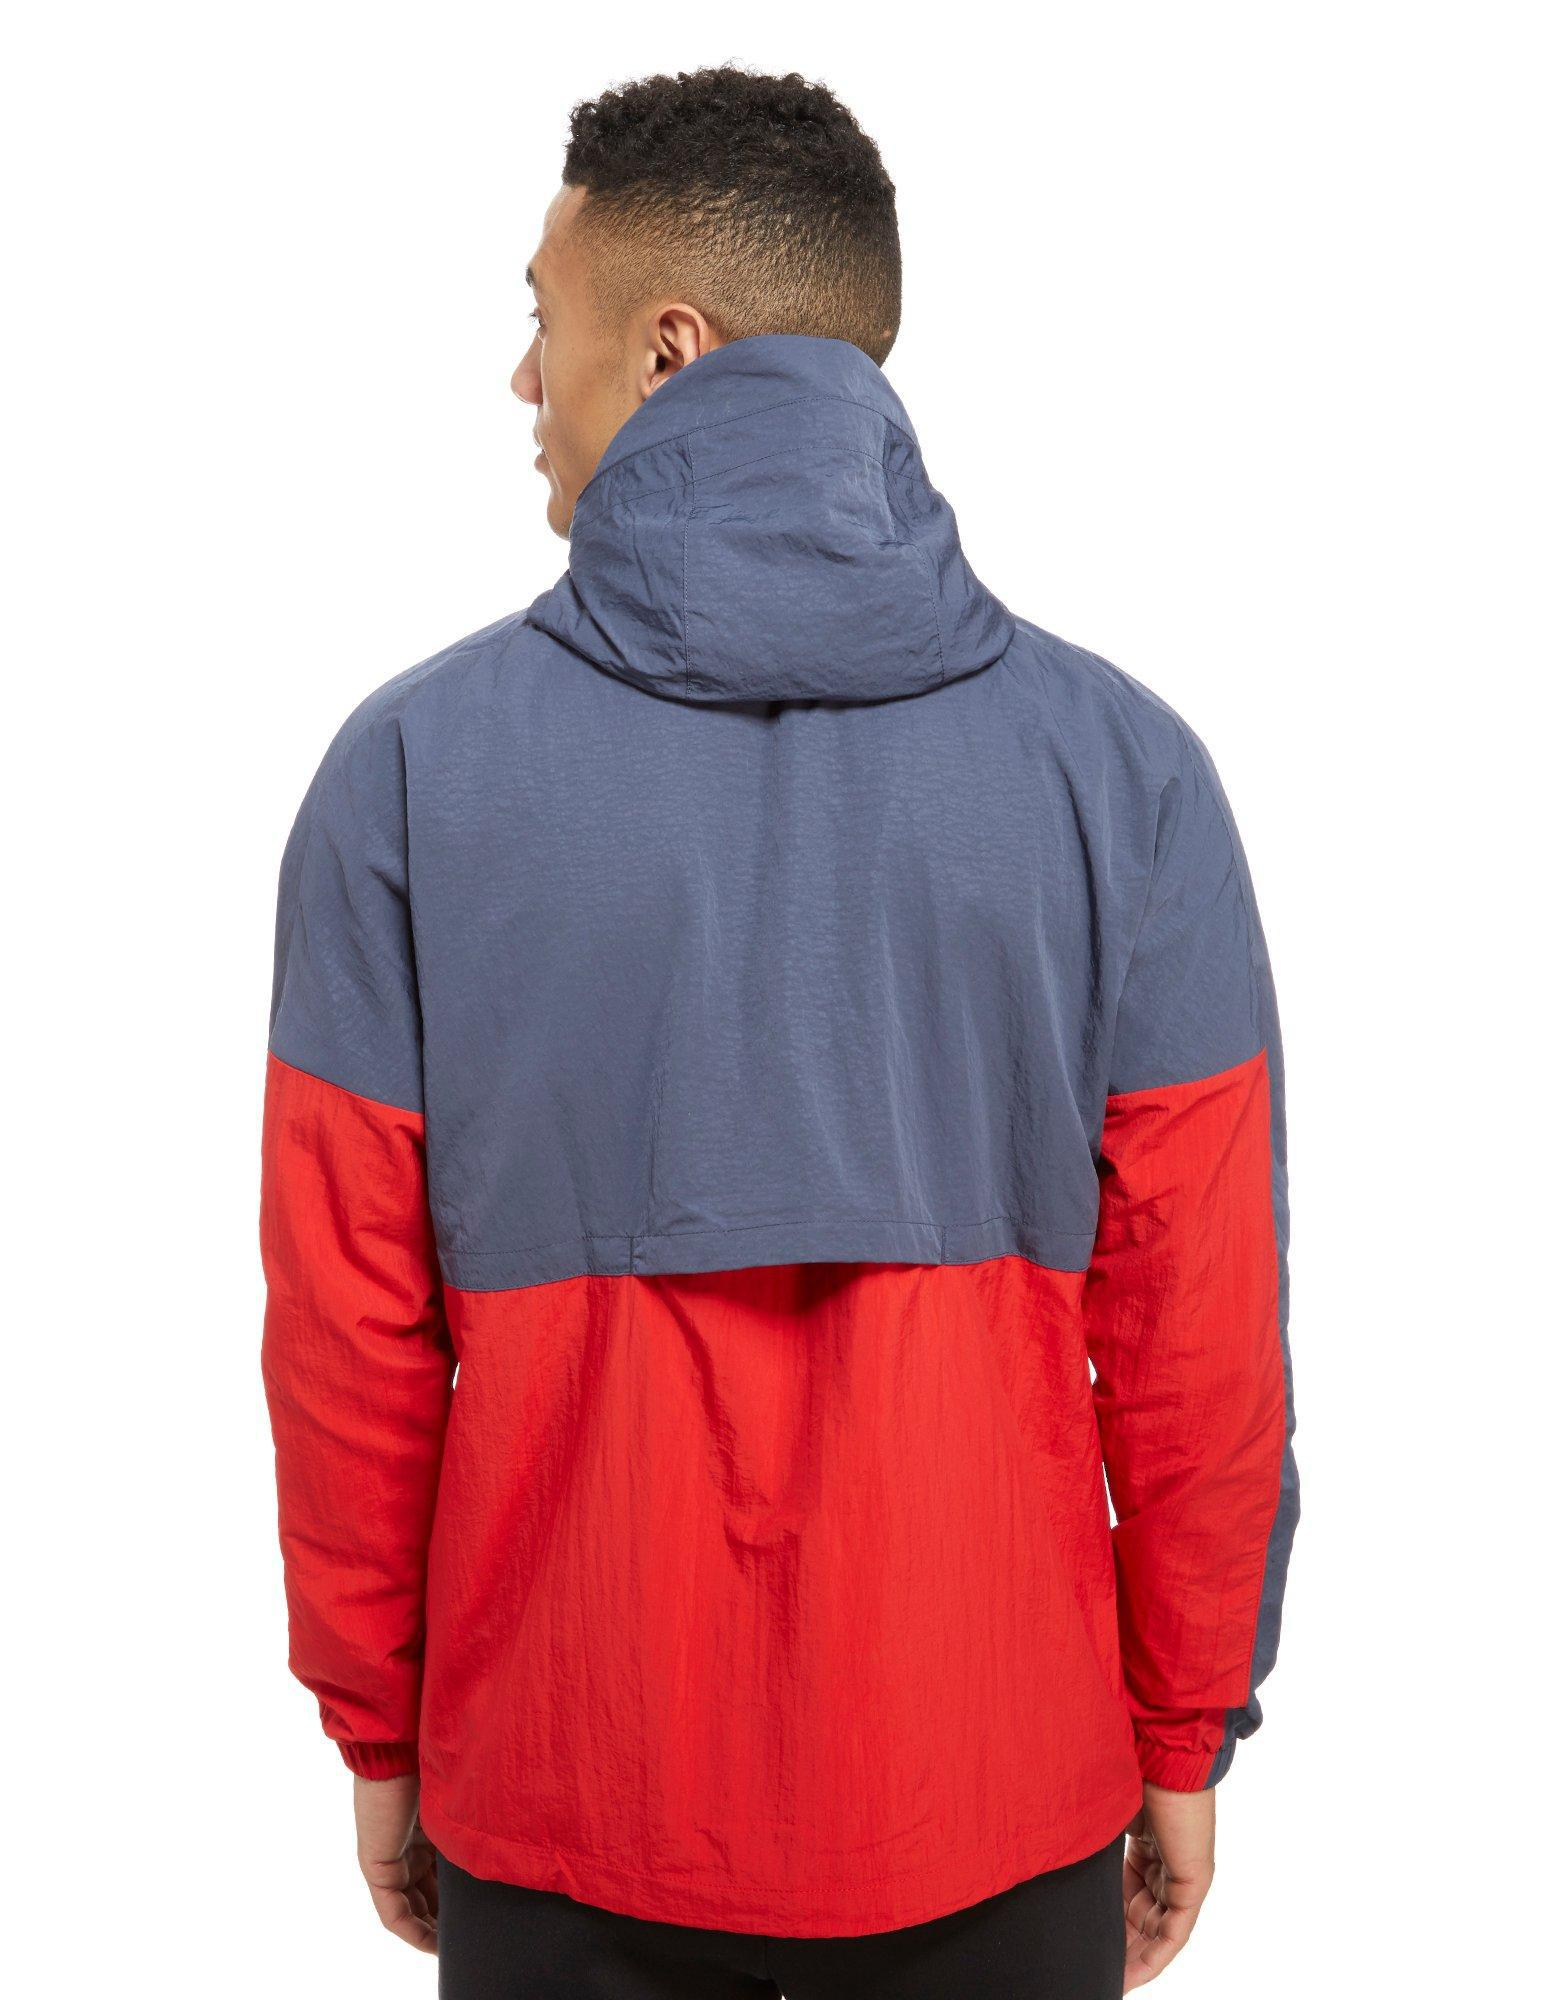 lyst nike air 1 2 zip jacket in red for men. Black Bedroom Furniture Sets. Home Design Ideas